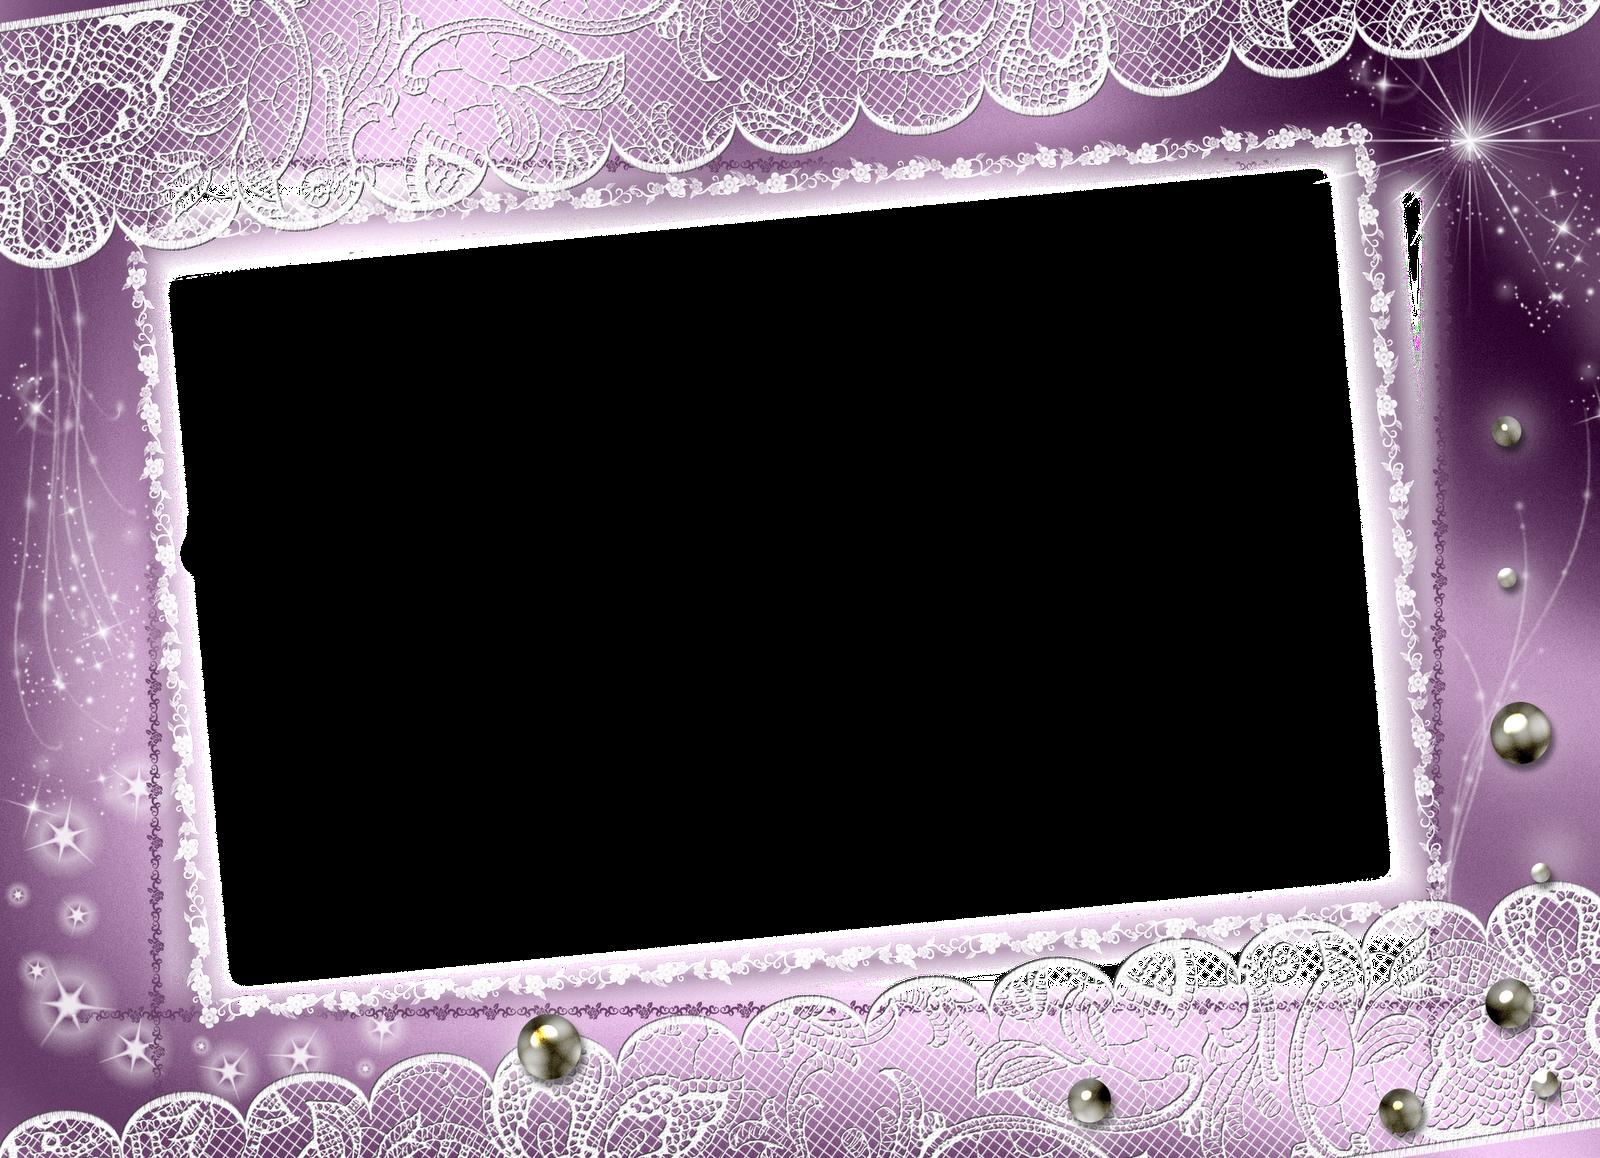 Marcos para fotos marcos para fotografias - Diy marcos para fotos ...